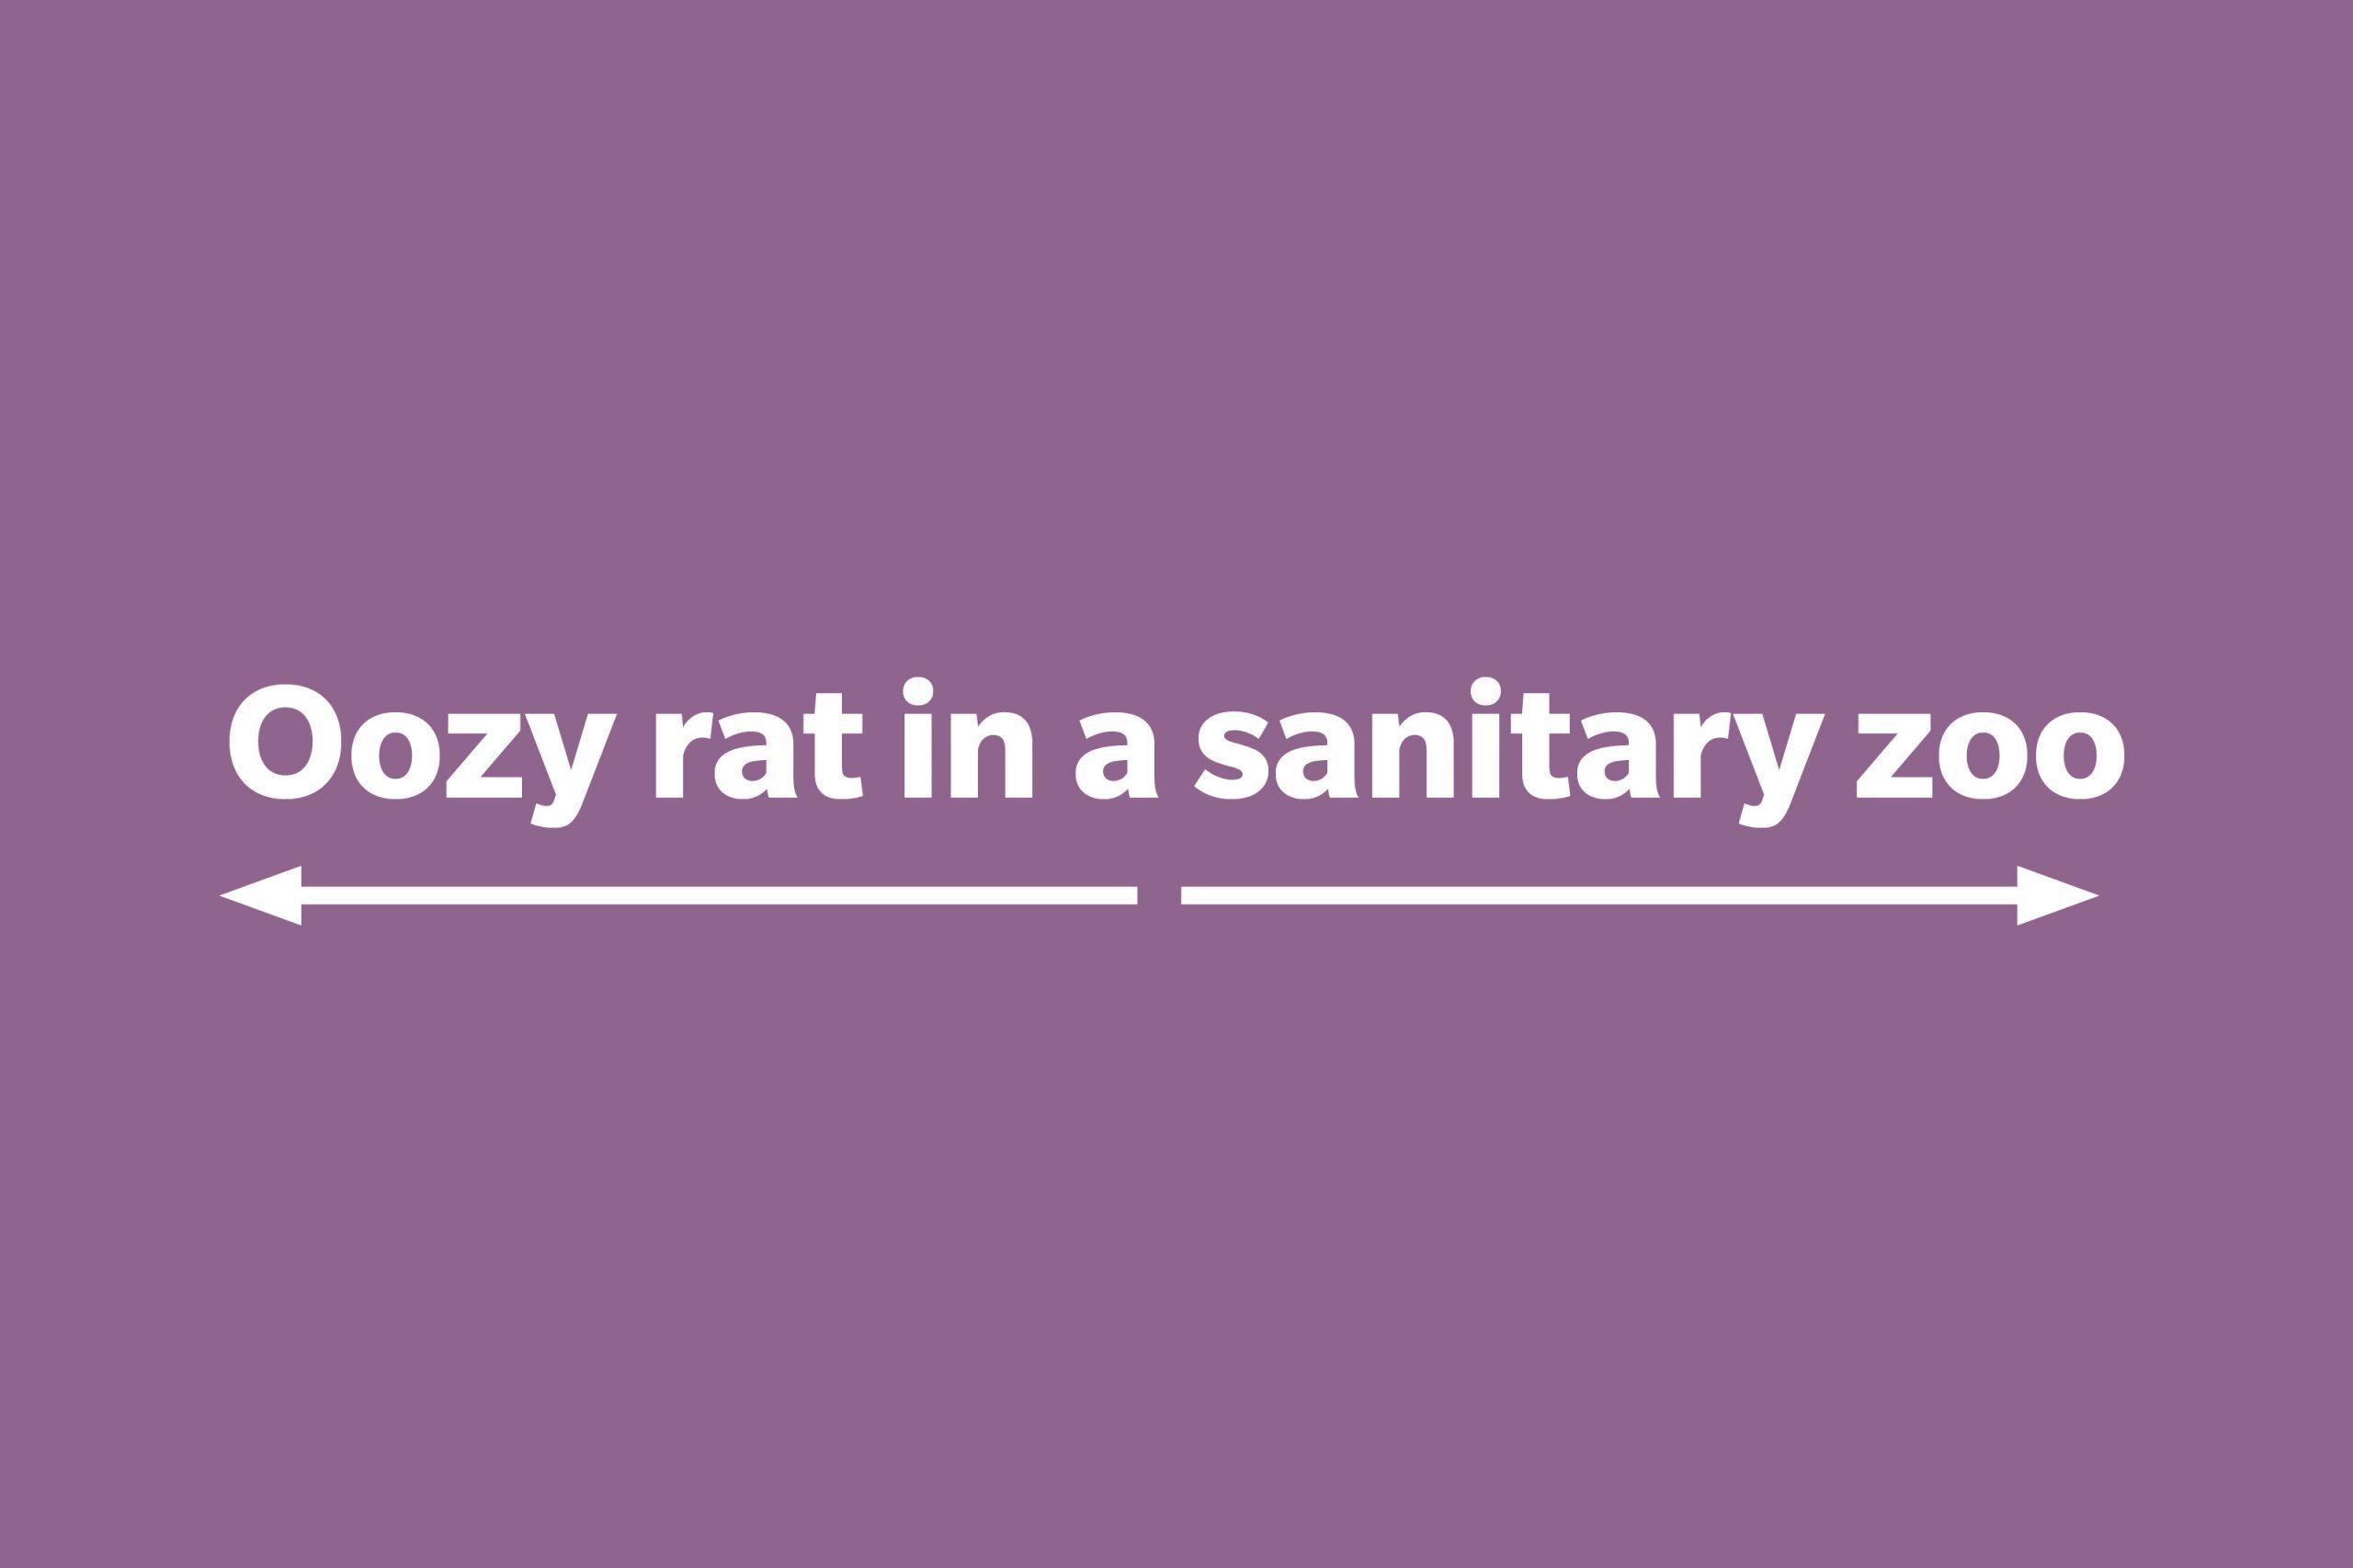 Oozy rat in a sanitary zoo